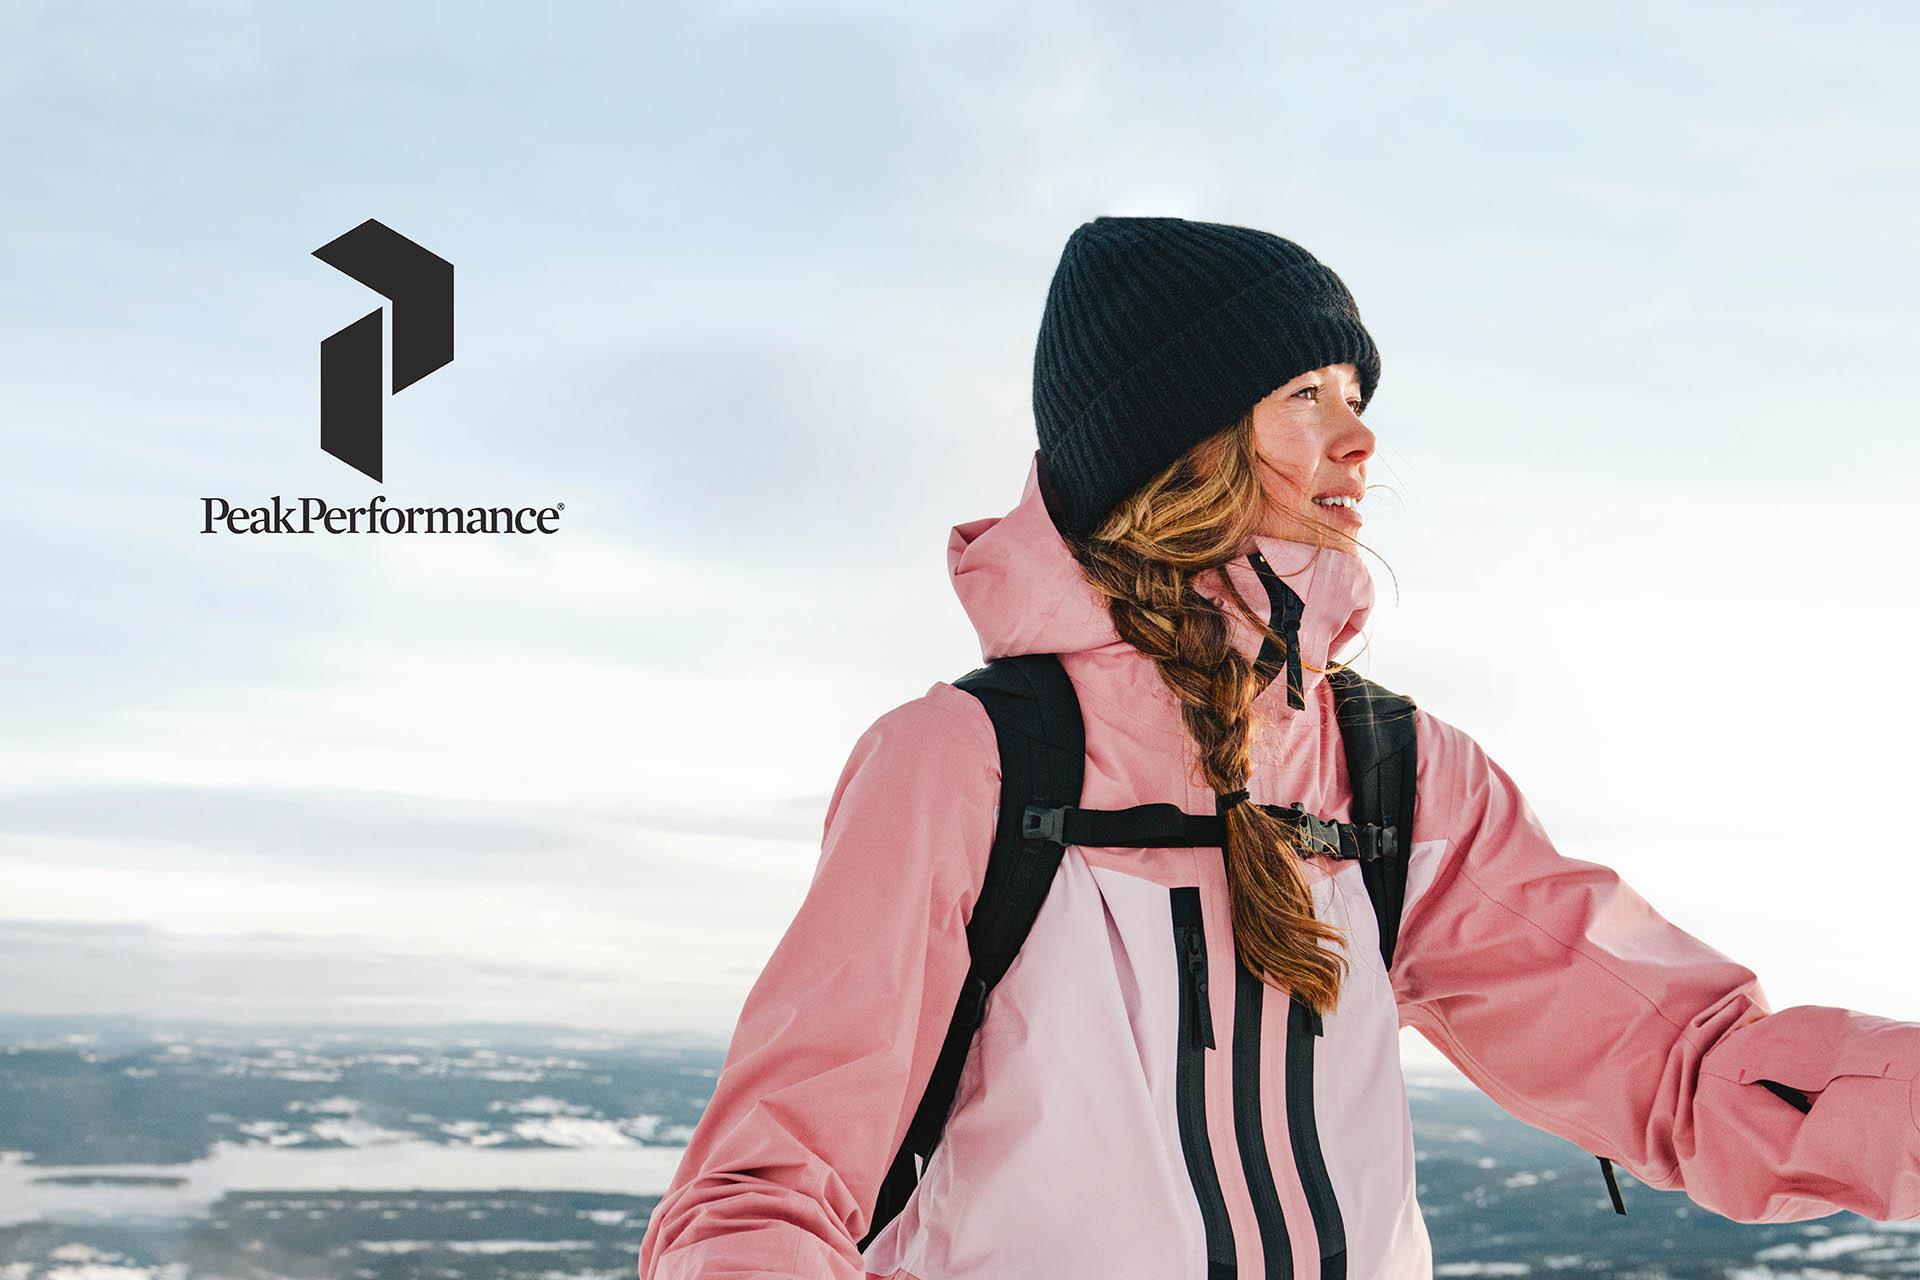 World of Outdoor - Peak Performance Allgäu Sportfachgeschäft Sportladen Bekleidung Schuhe Ausrüstung Damen Herren